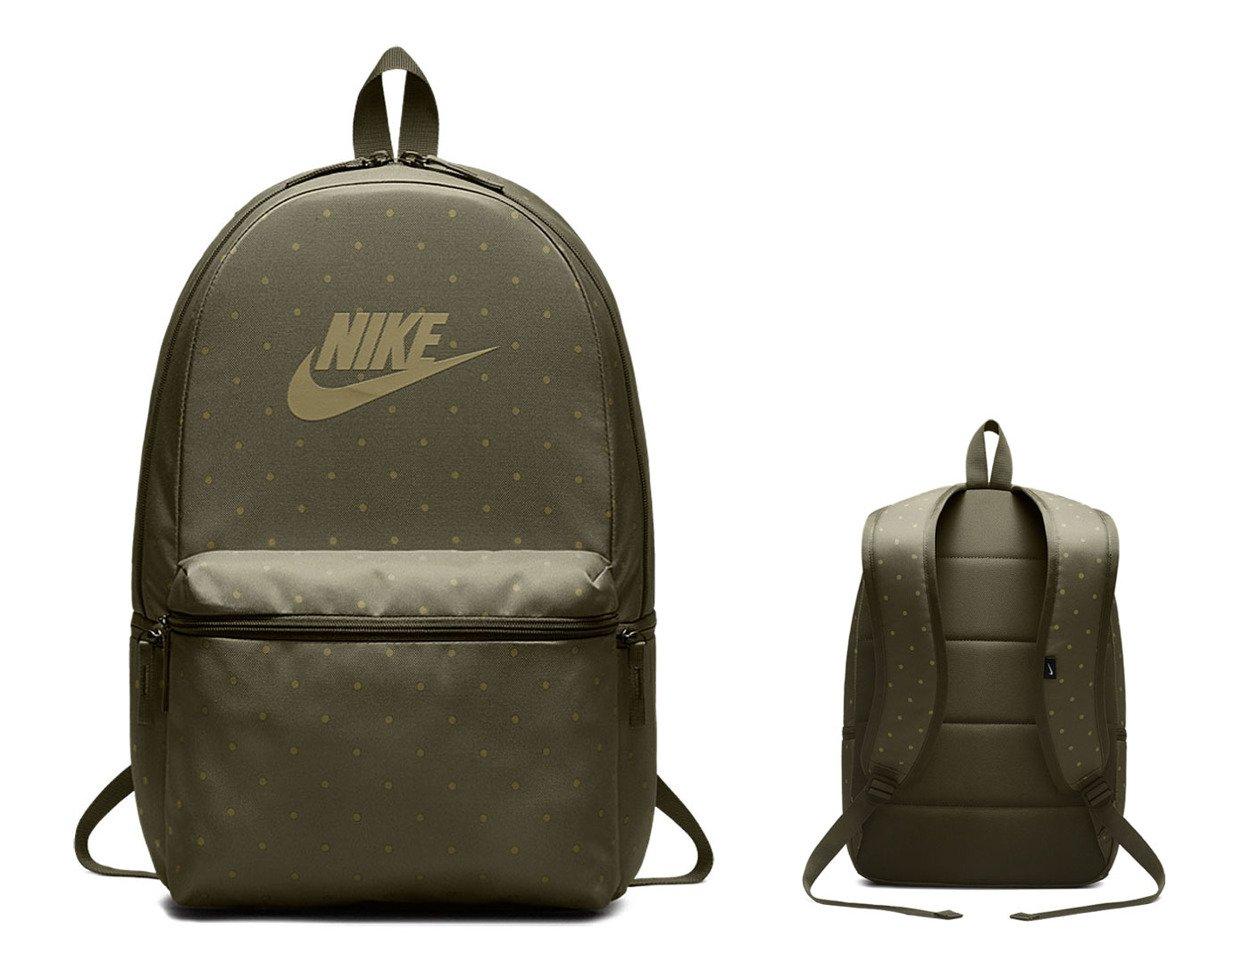 8481f76d5d88f Zielony plecak szkolny Nike Hertiage Backpack BA5761-222 ...